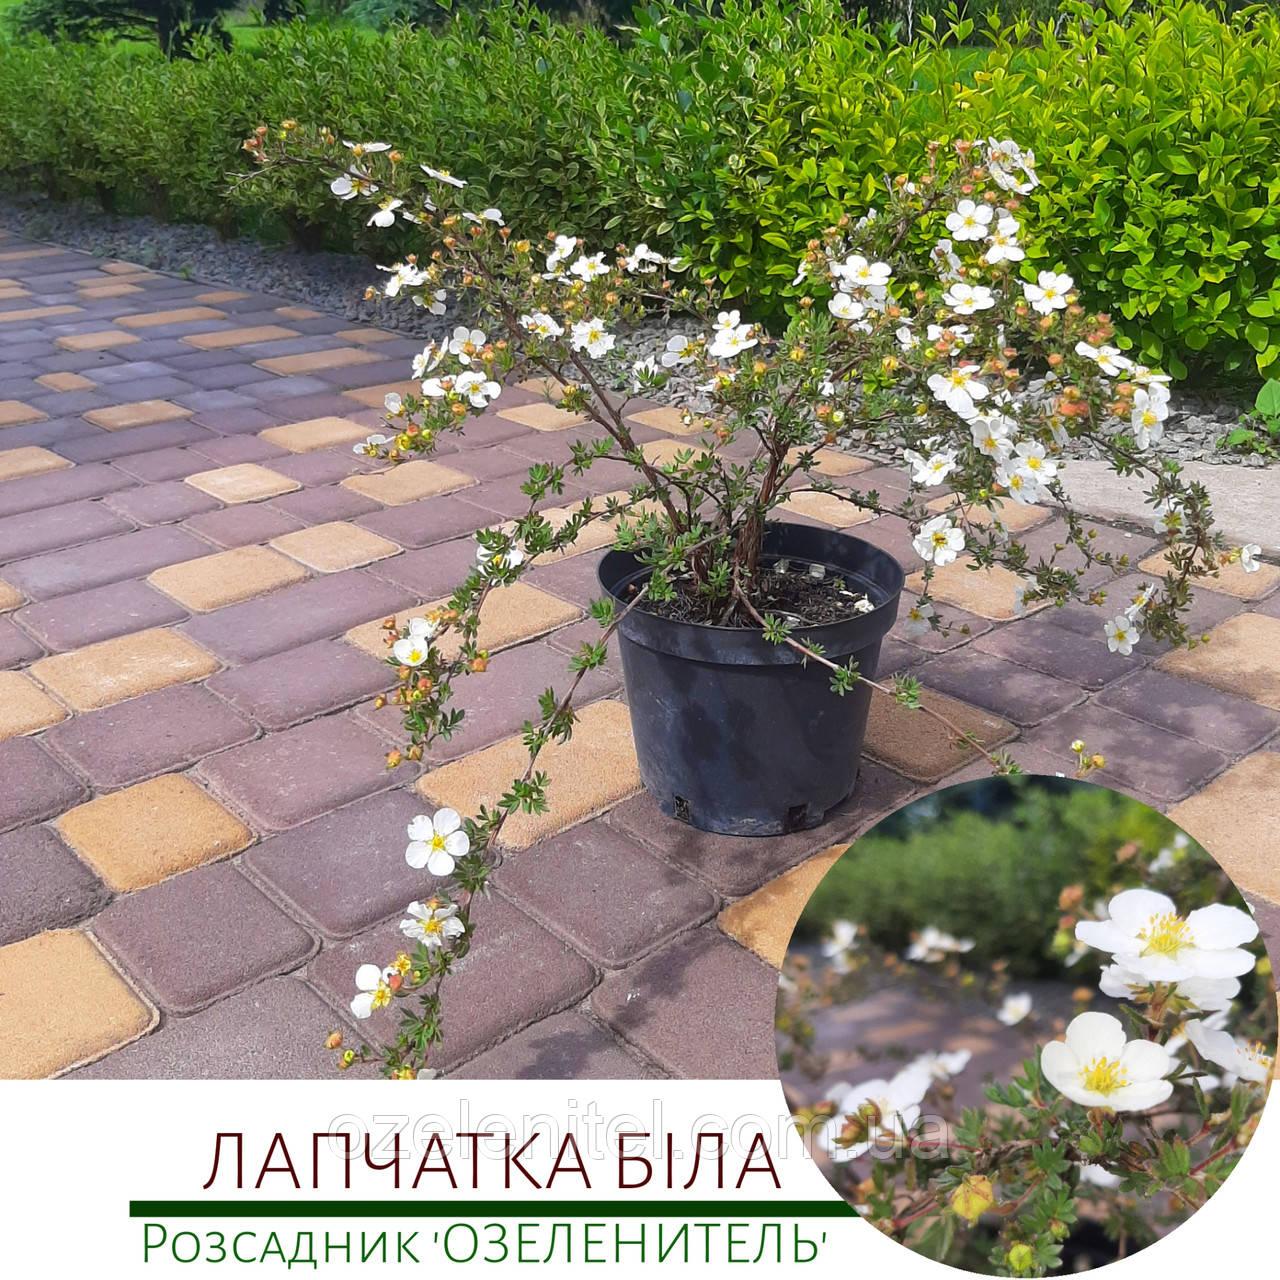 Лапчатка біла/ Лапчатка белая/ Potentilla alba